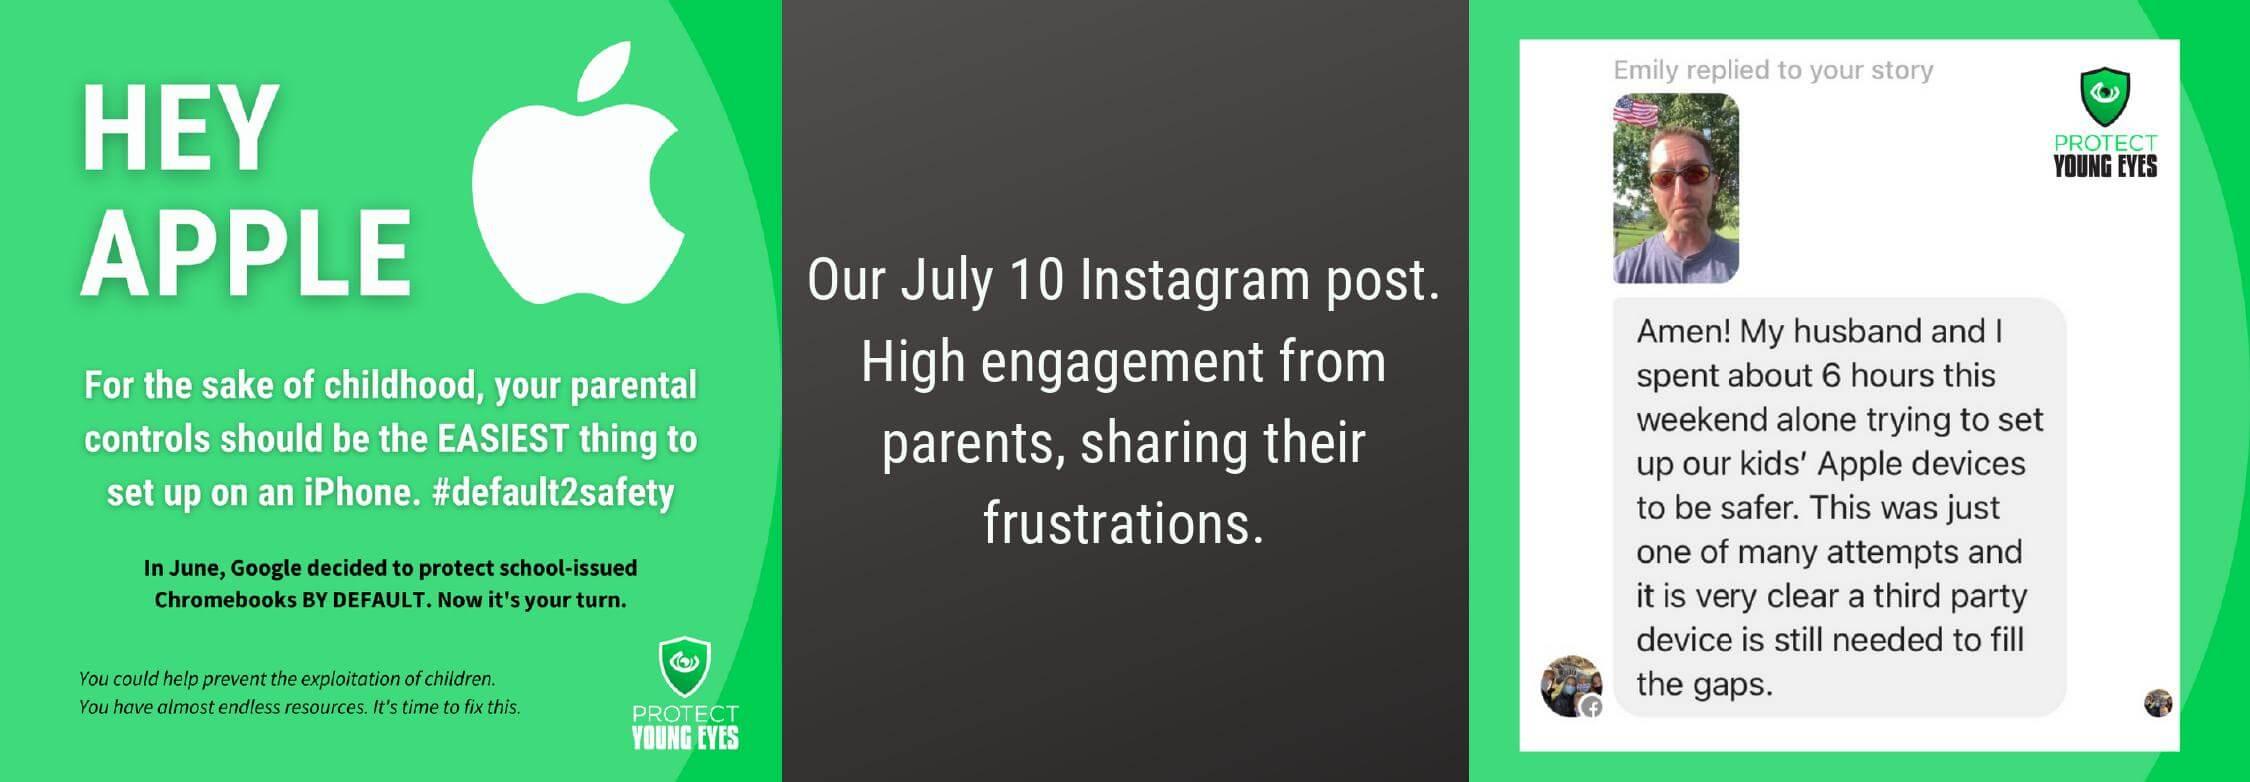 Screen Time Apple Parental Controls Campaign - Instagram Post